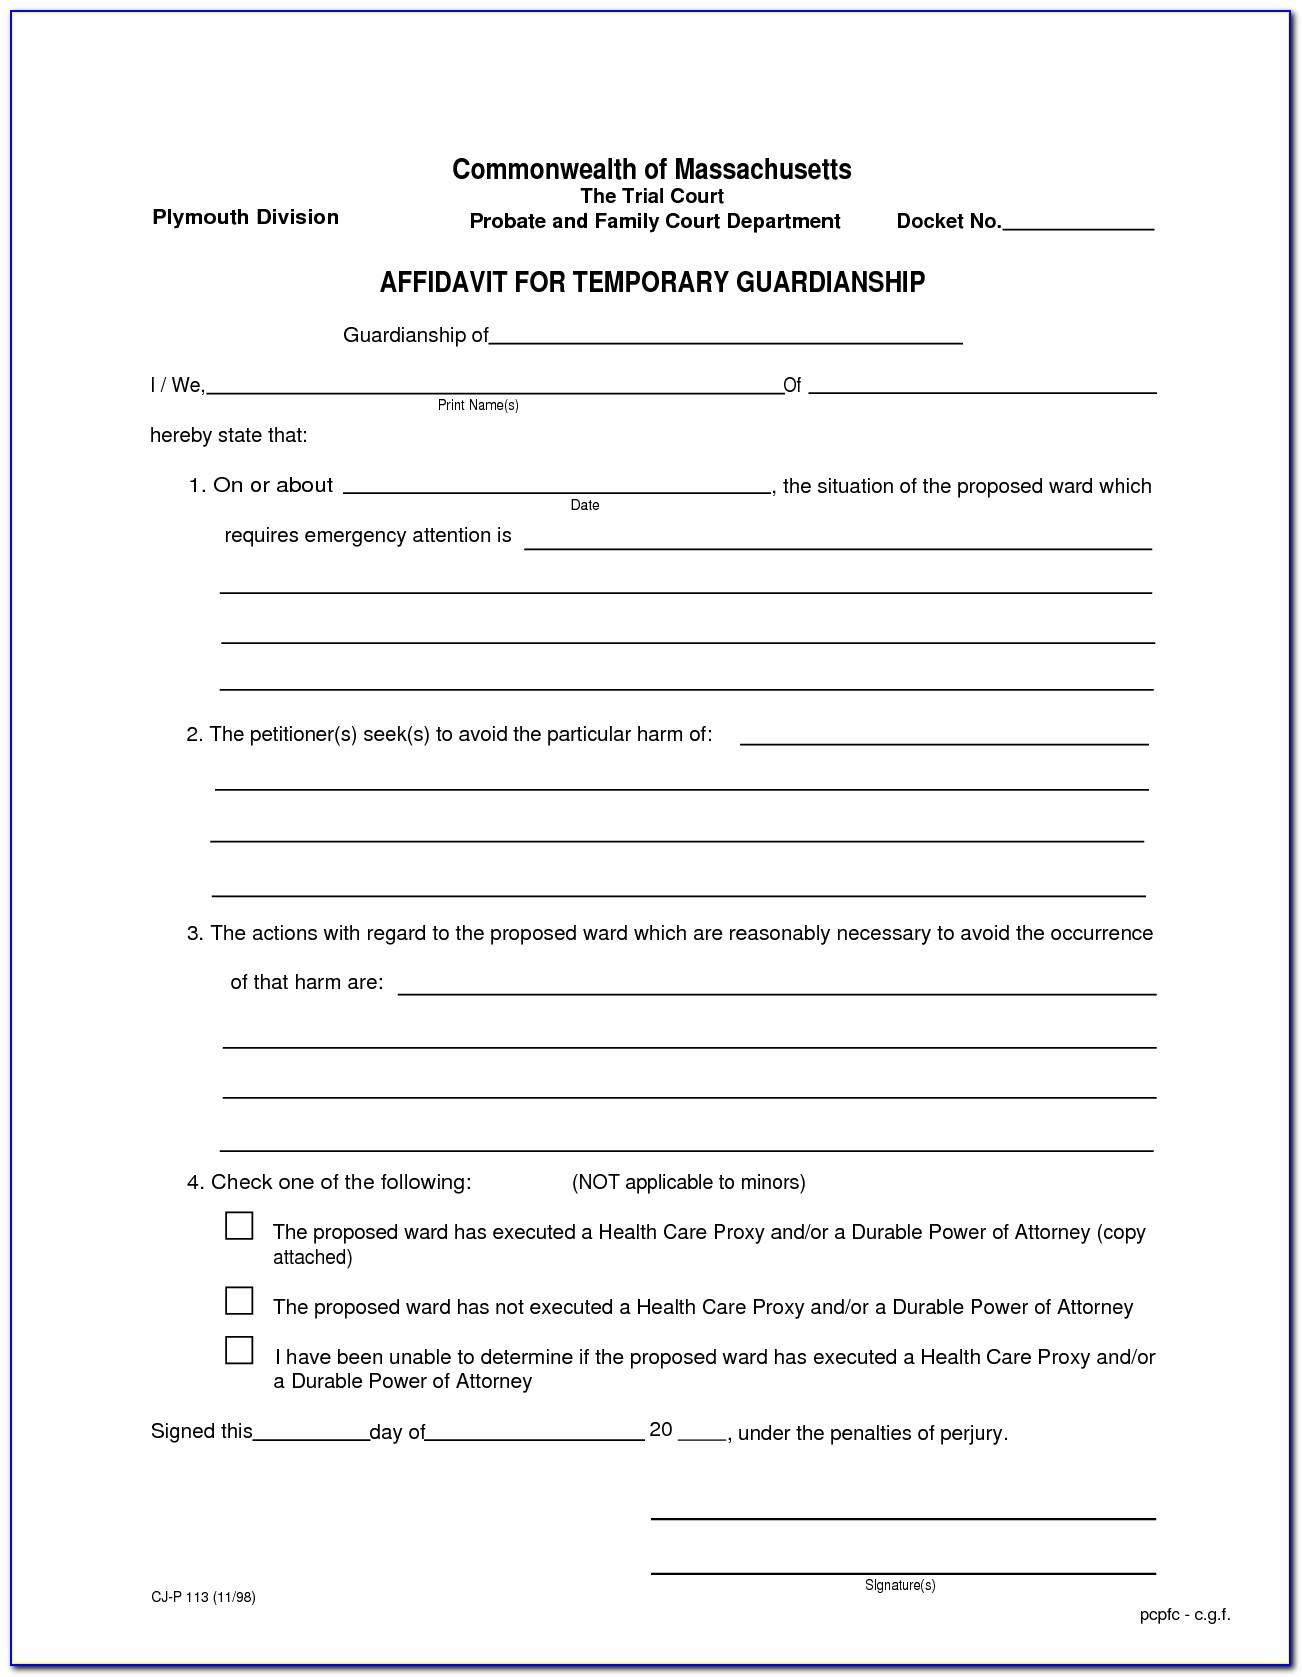 Florida Bar Association Durable Power Of Attorney Form